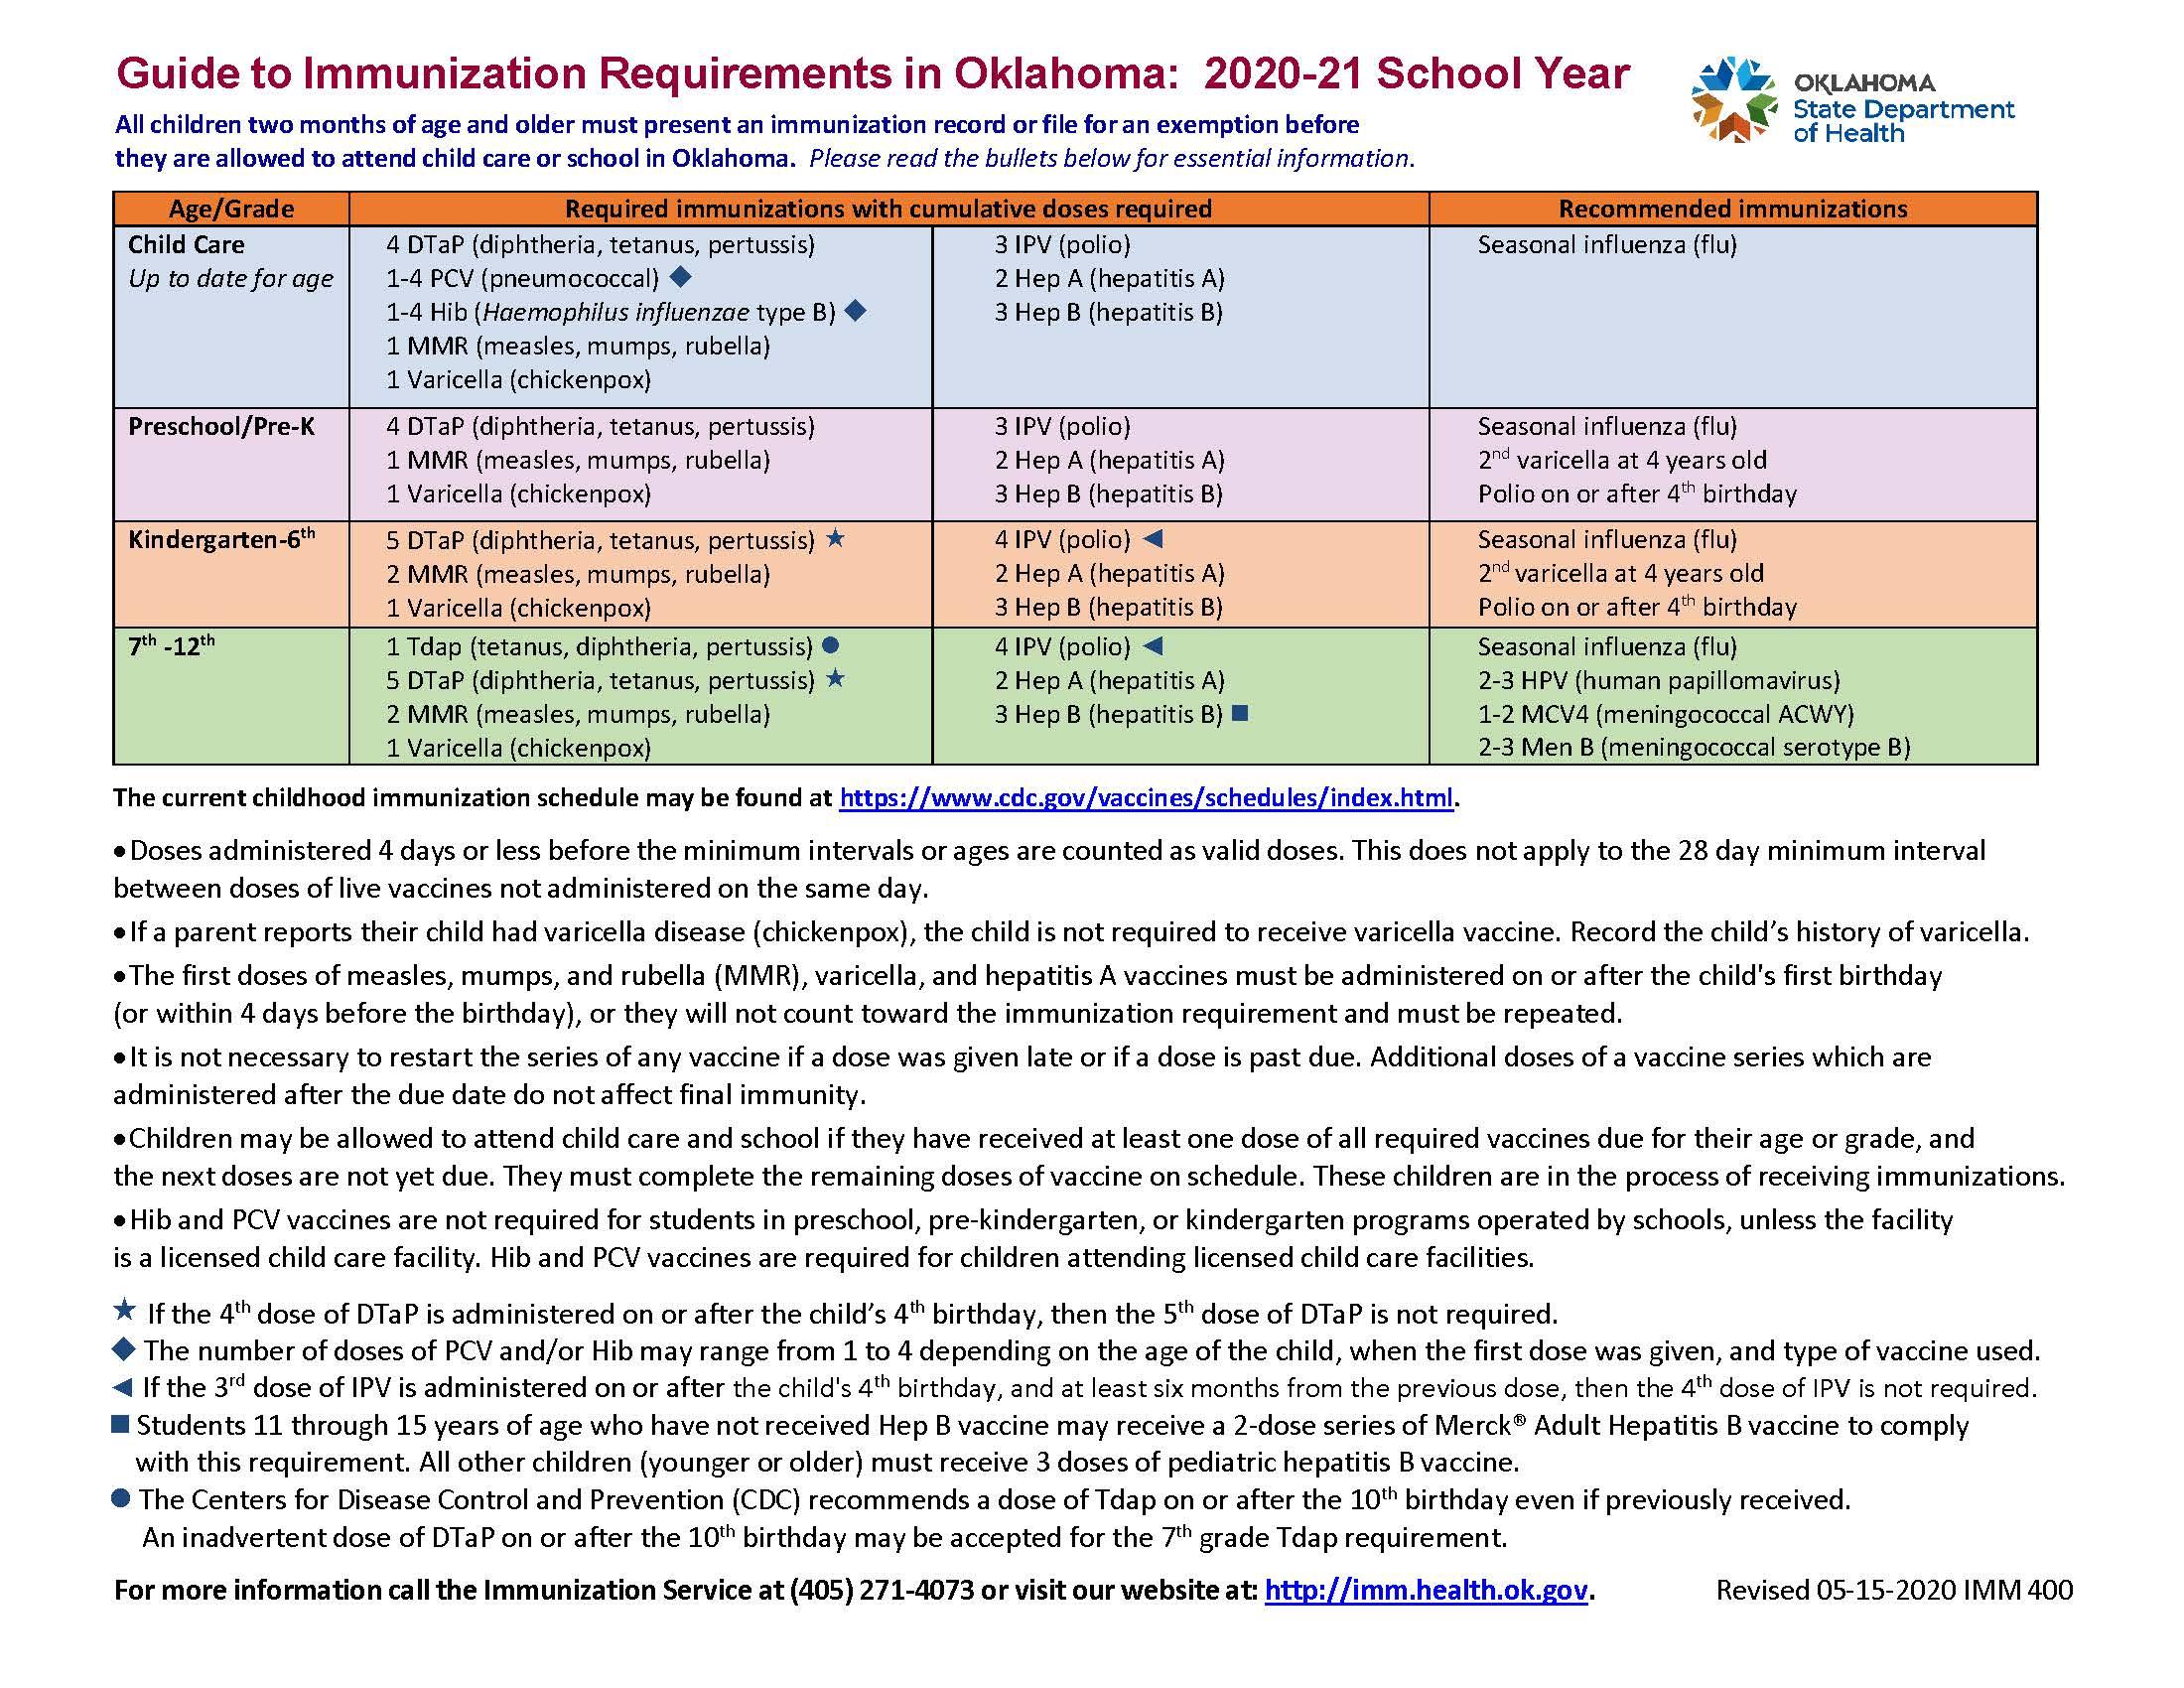 Immunization Guide for Oklahoma